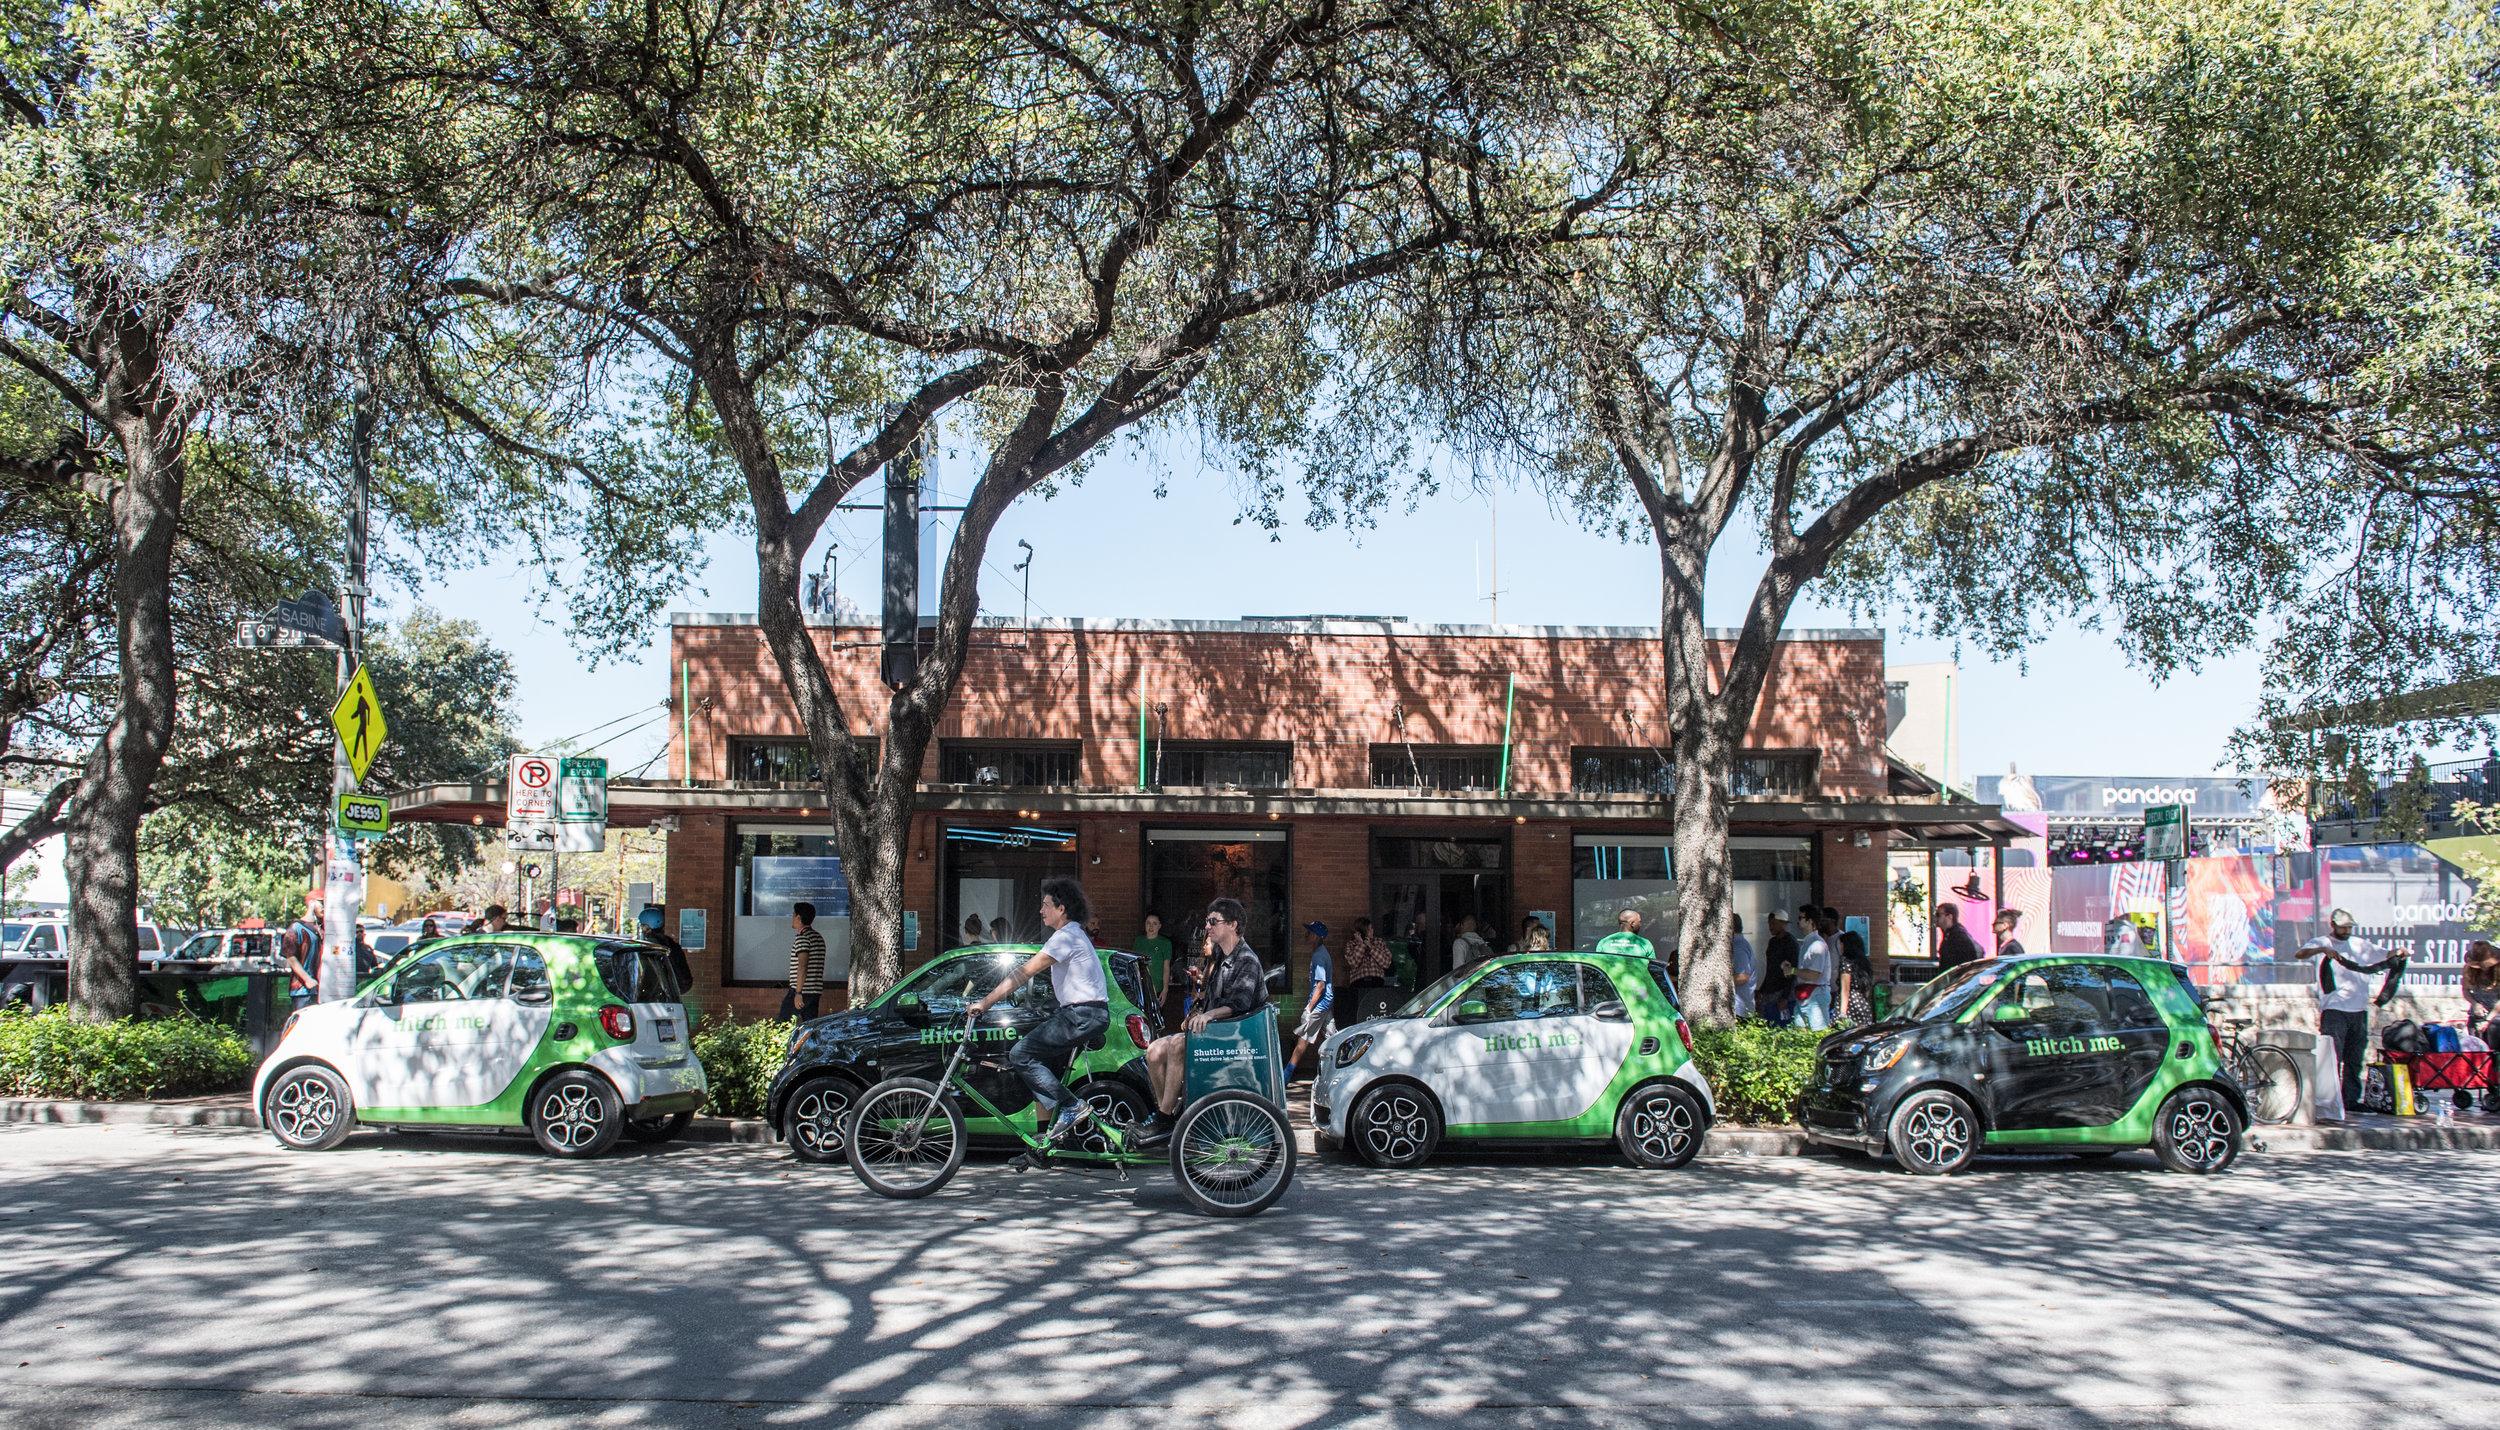 K-MB_houseofsmart_Austin_Pedicabs (1).jpg